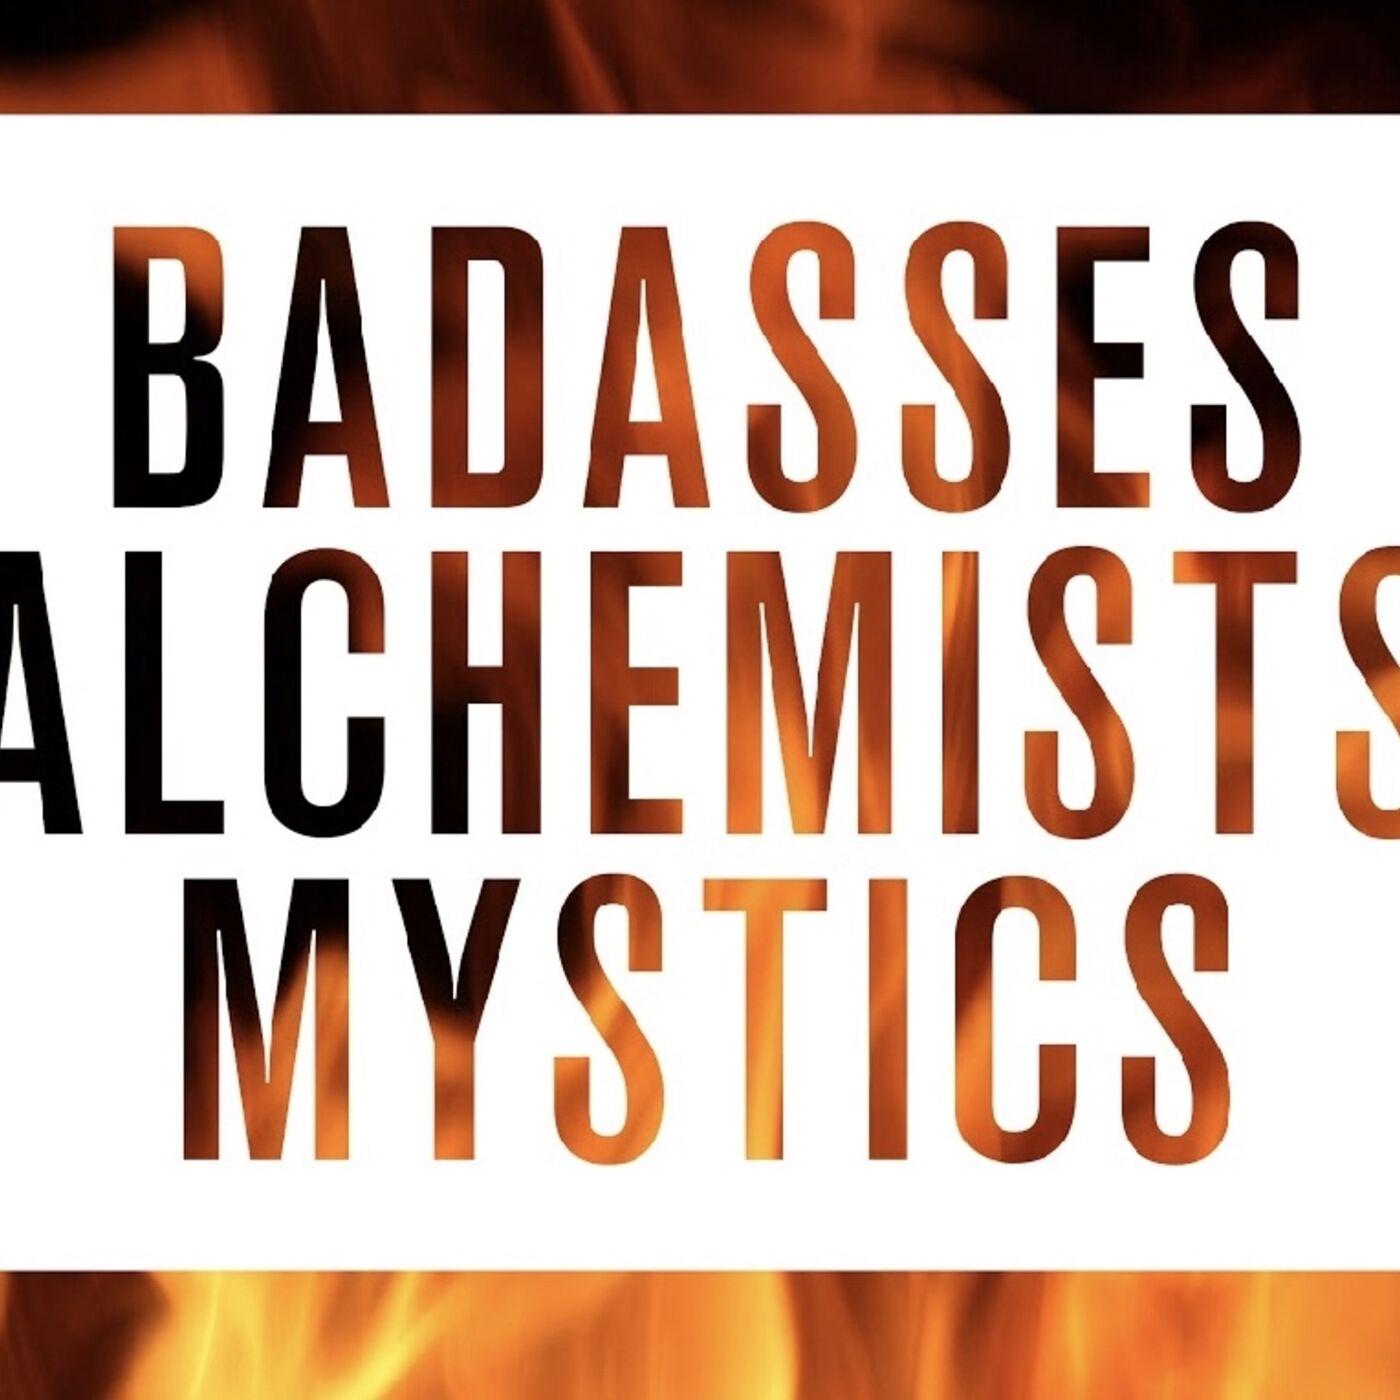 BAM - Badassery, Alchemy and Mysticism in Everyone